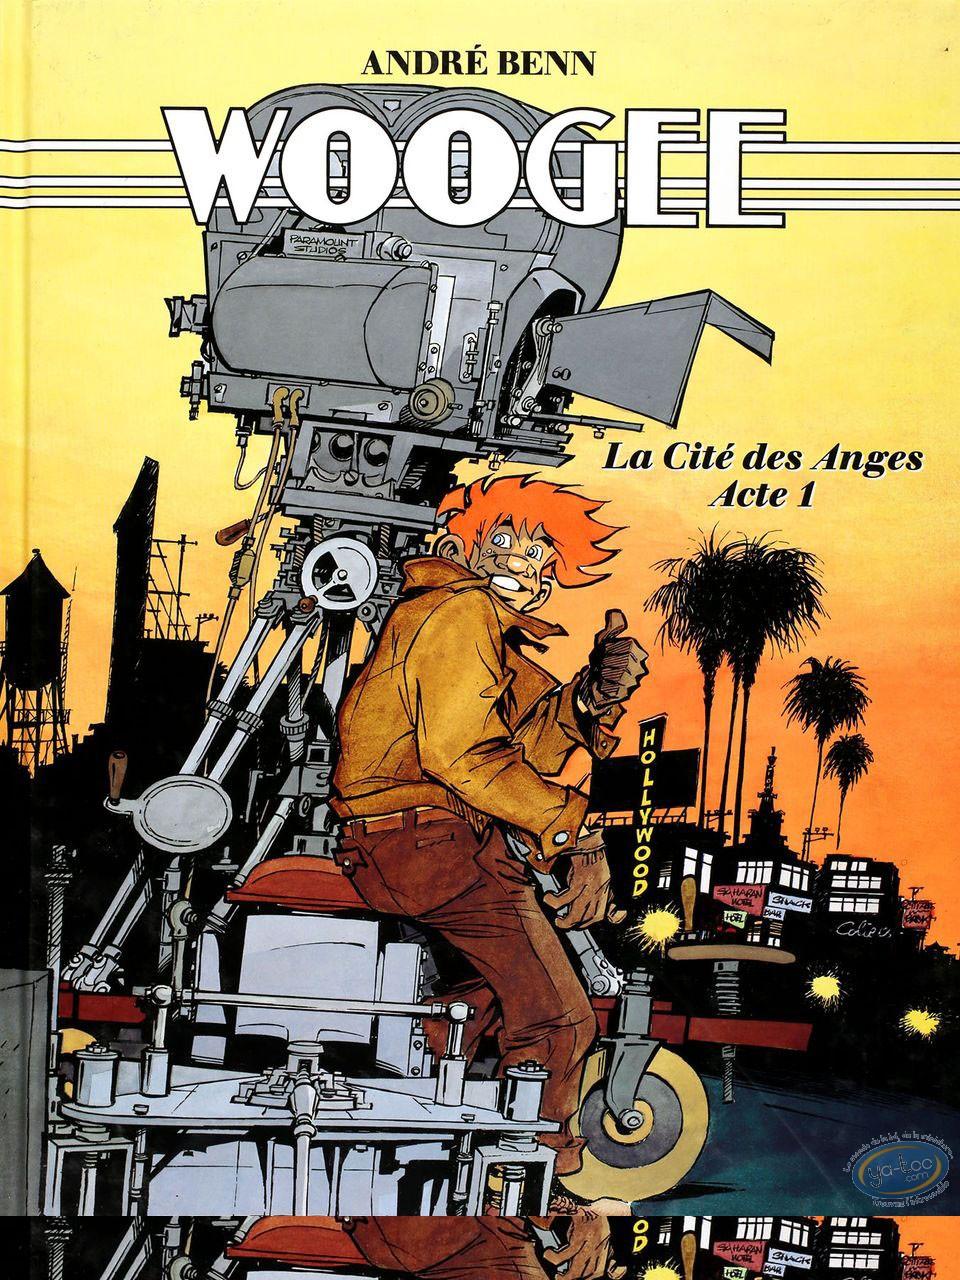 Listed European Comic Books, Woogee : Woogee